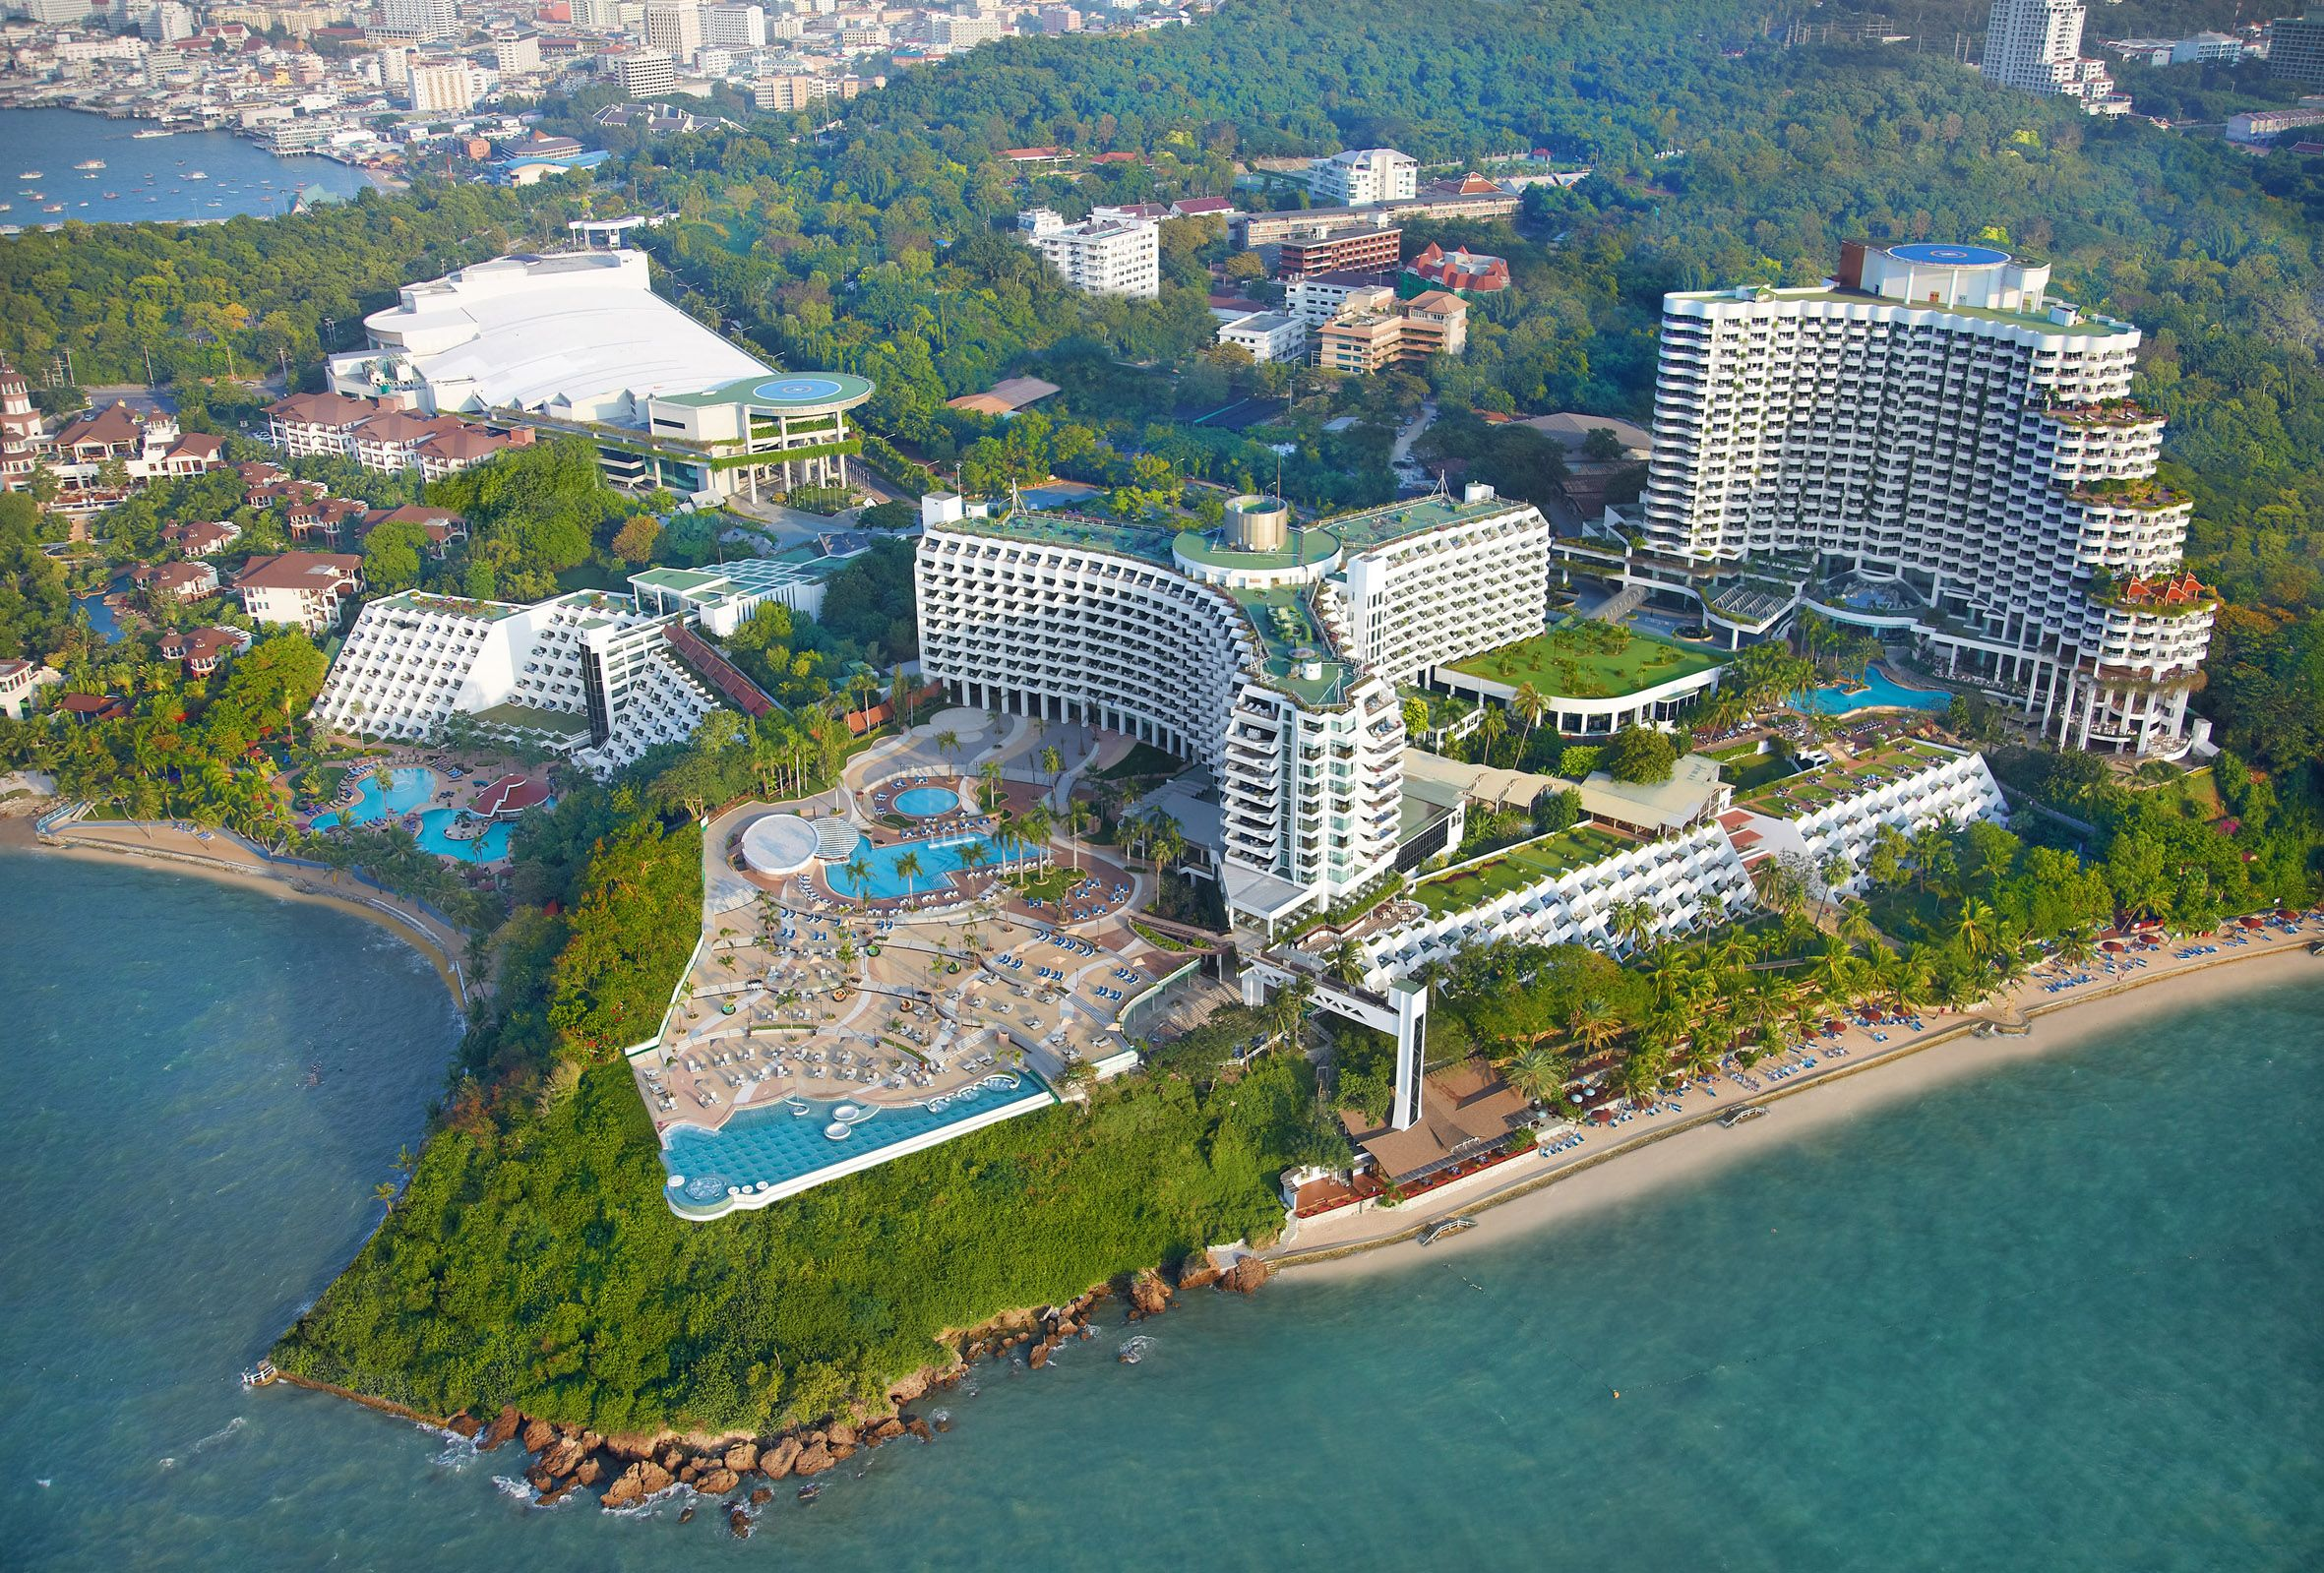 Royal Cliff Hotels Group Pattaya Thailand Royalcliff Luxury Travel Http